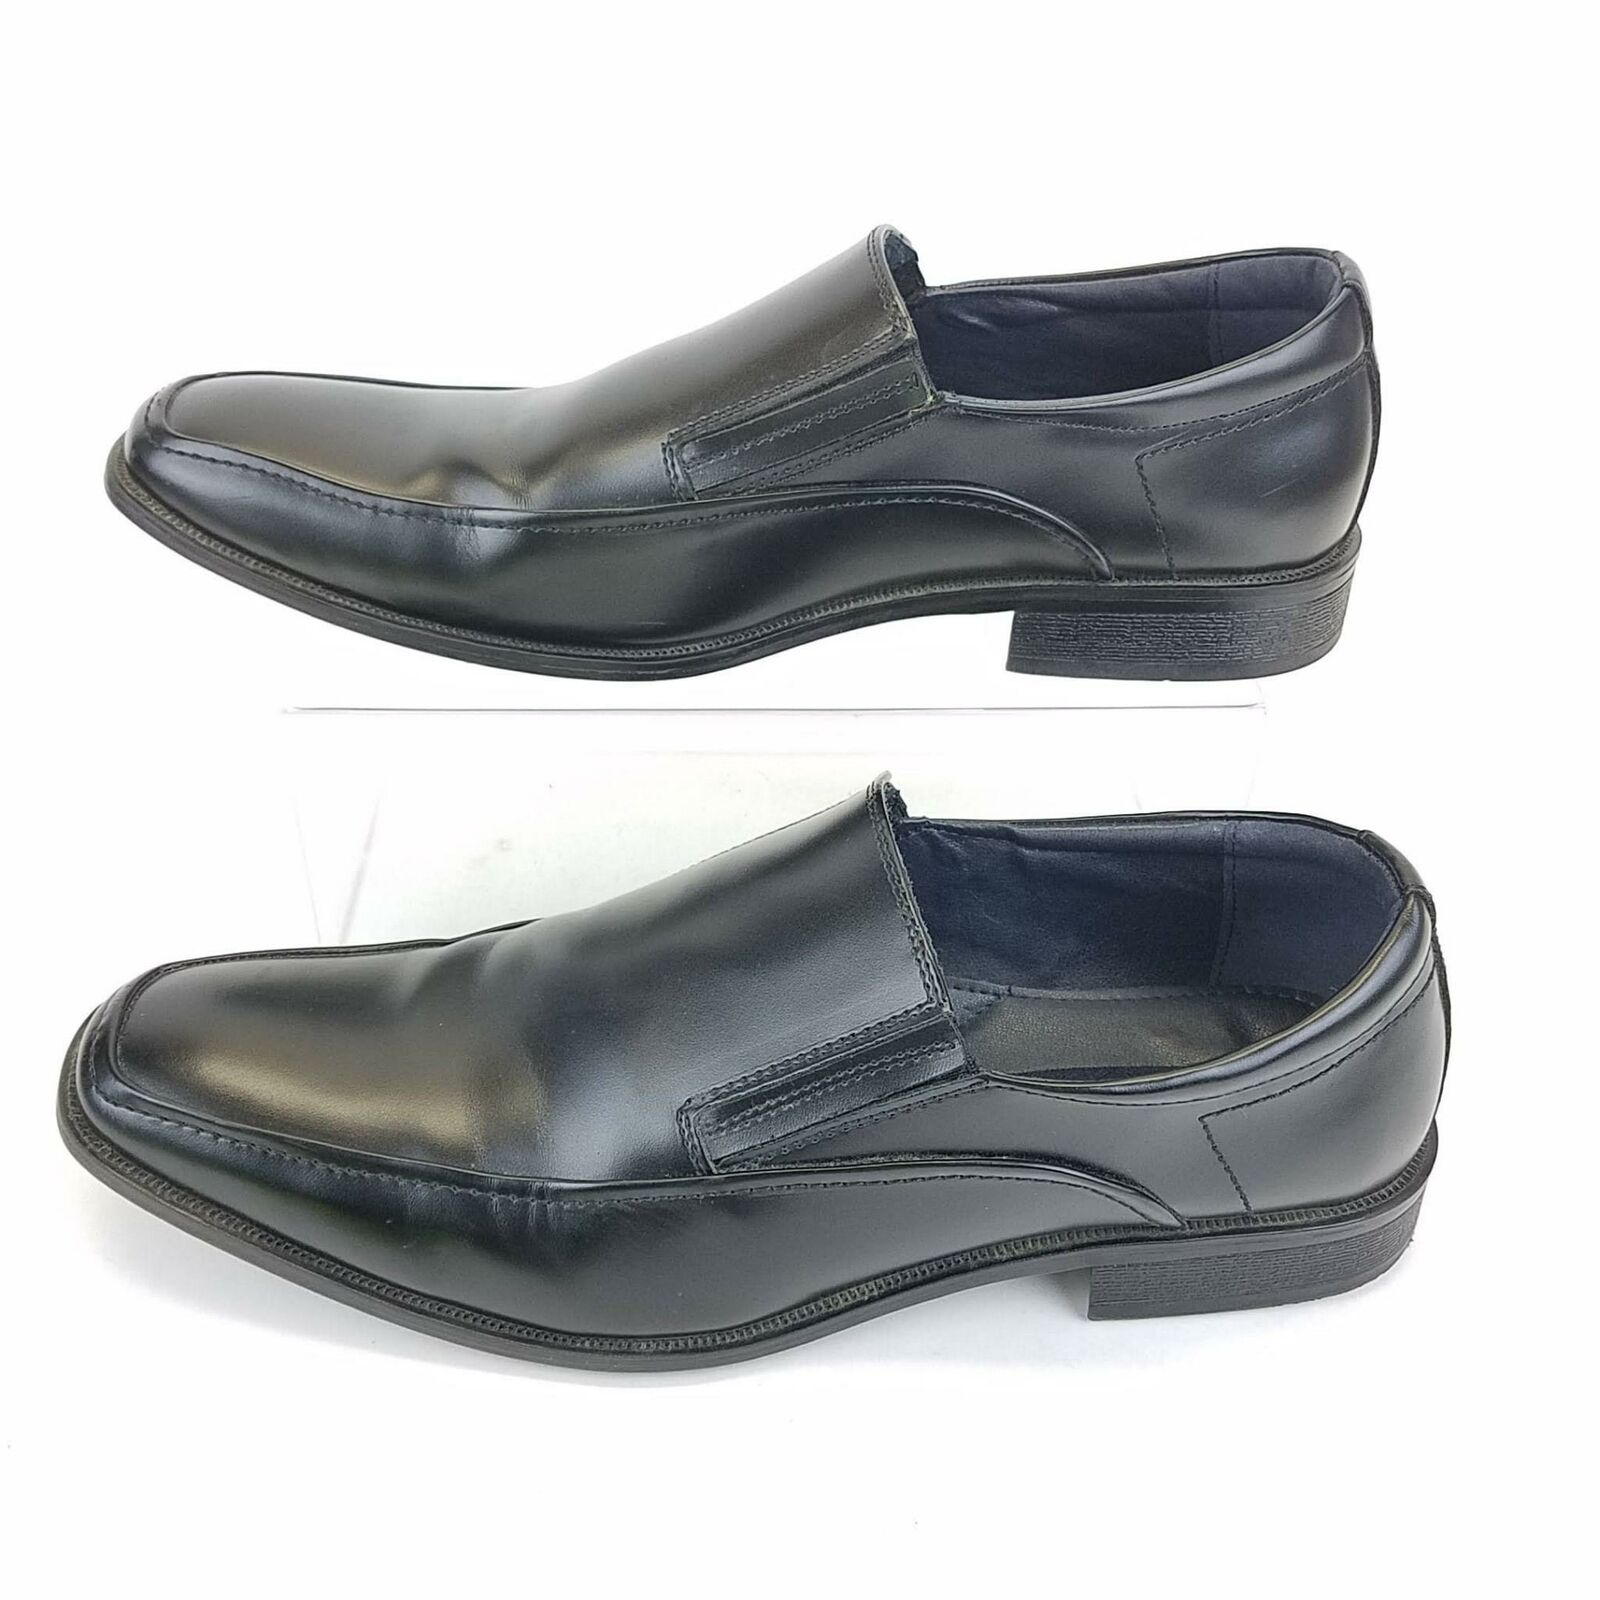 Joseph Abboud Square Toe Loafer Slip On Mens Shoe 13 Black Leather